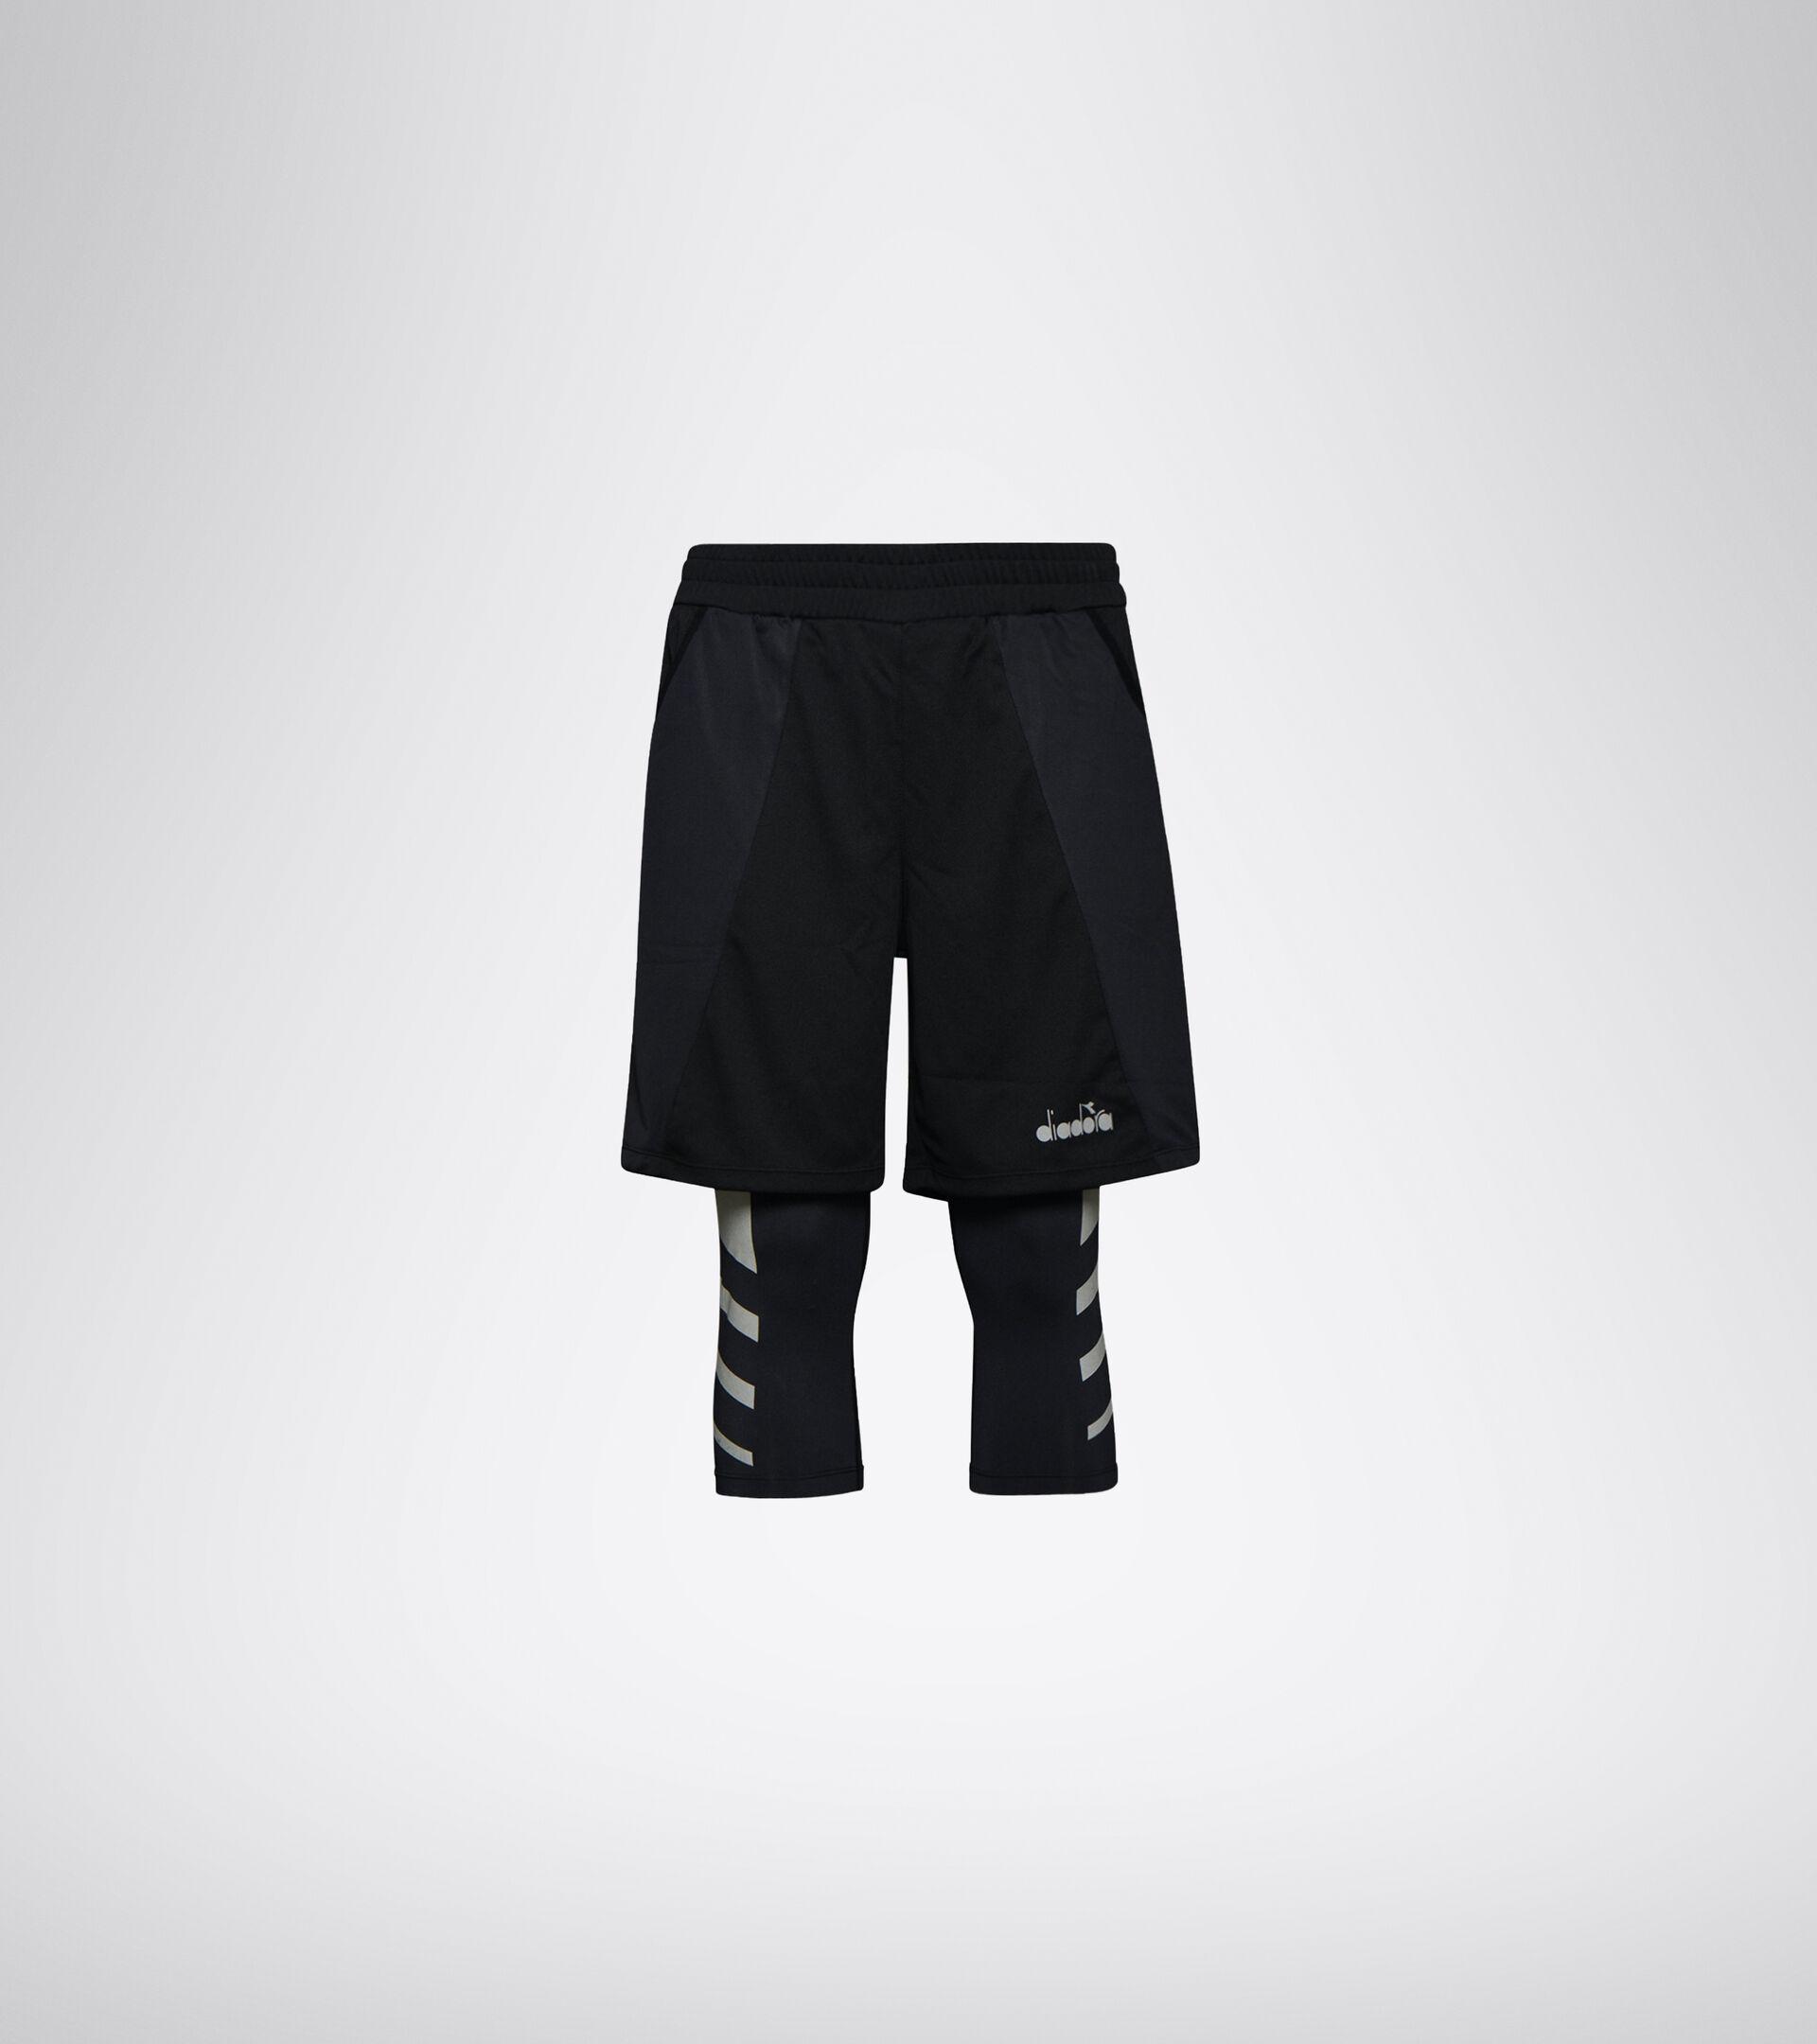 Lauf-Shorts - Herren POWER SHORTS BE ONE SCHWARZ - Diadora